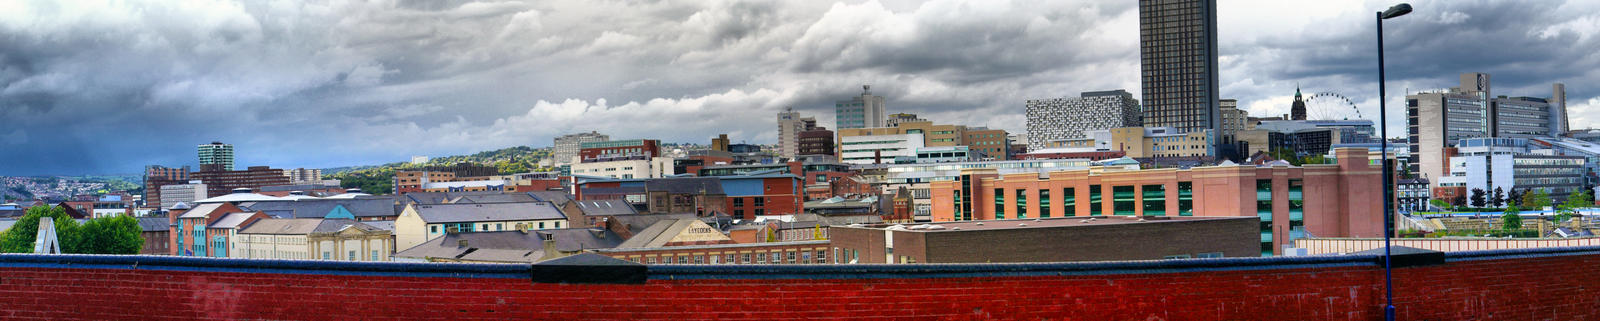 City: Sheffield 001 HDRi by letTheColorsRumble